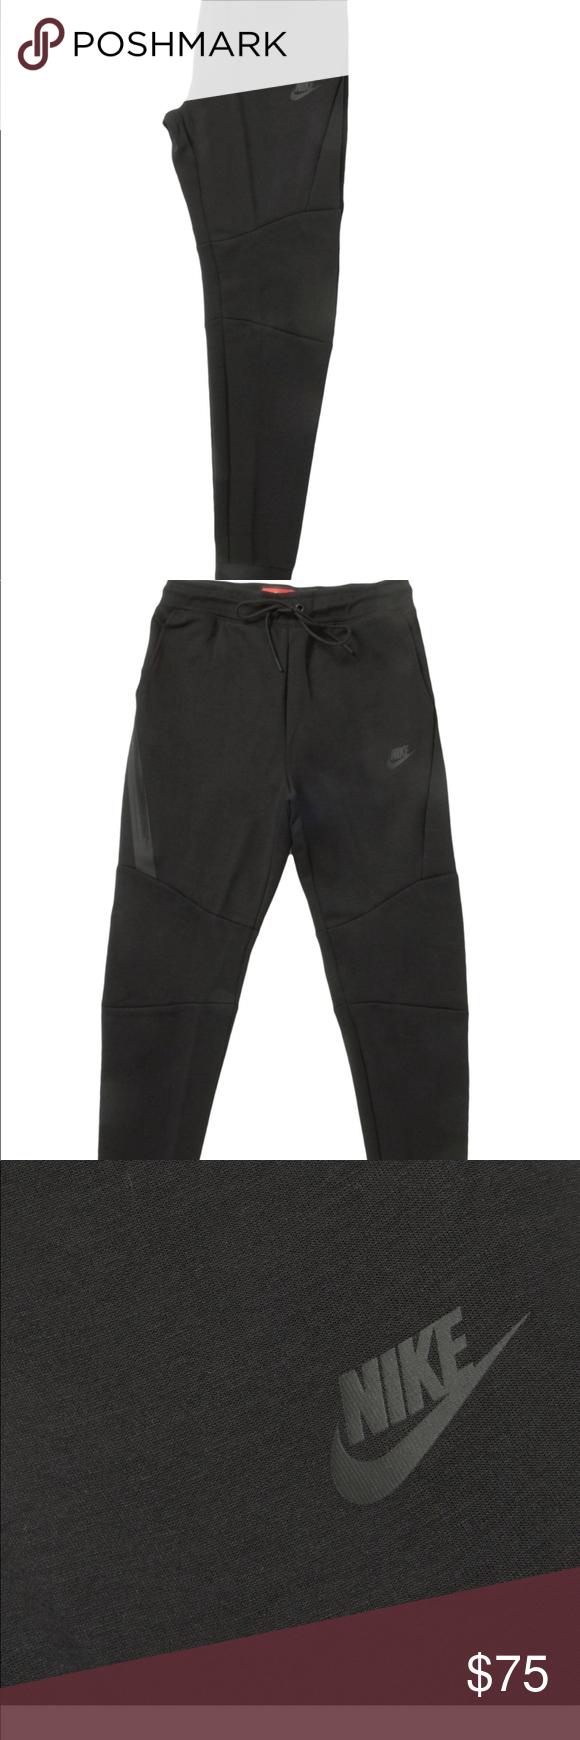 Nike men's tech fleece joggers Brand new black jogger